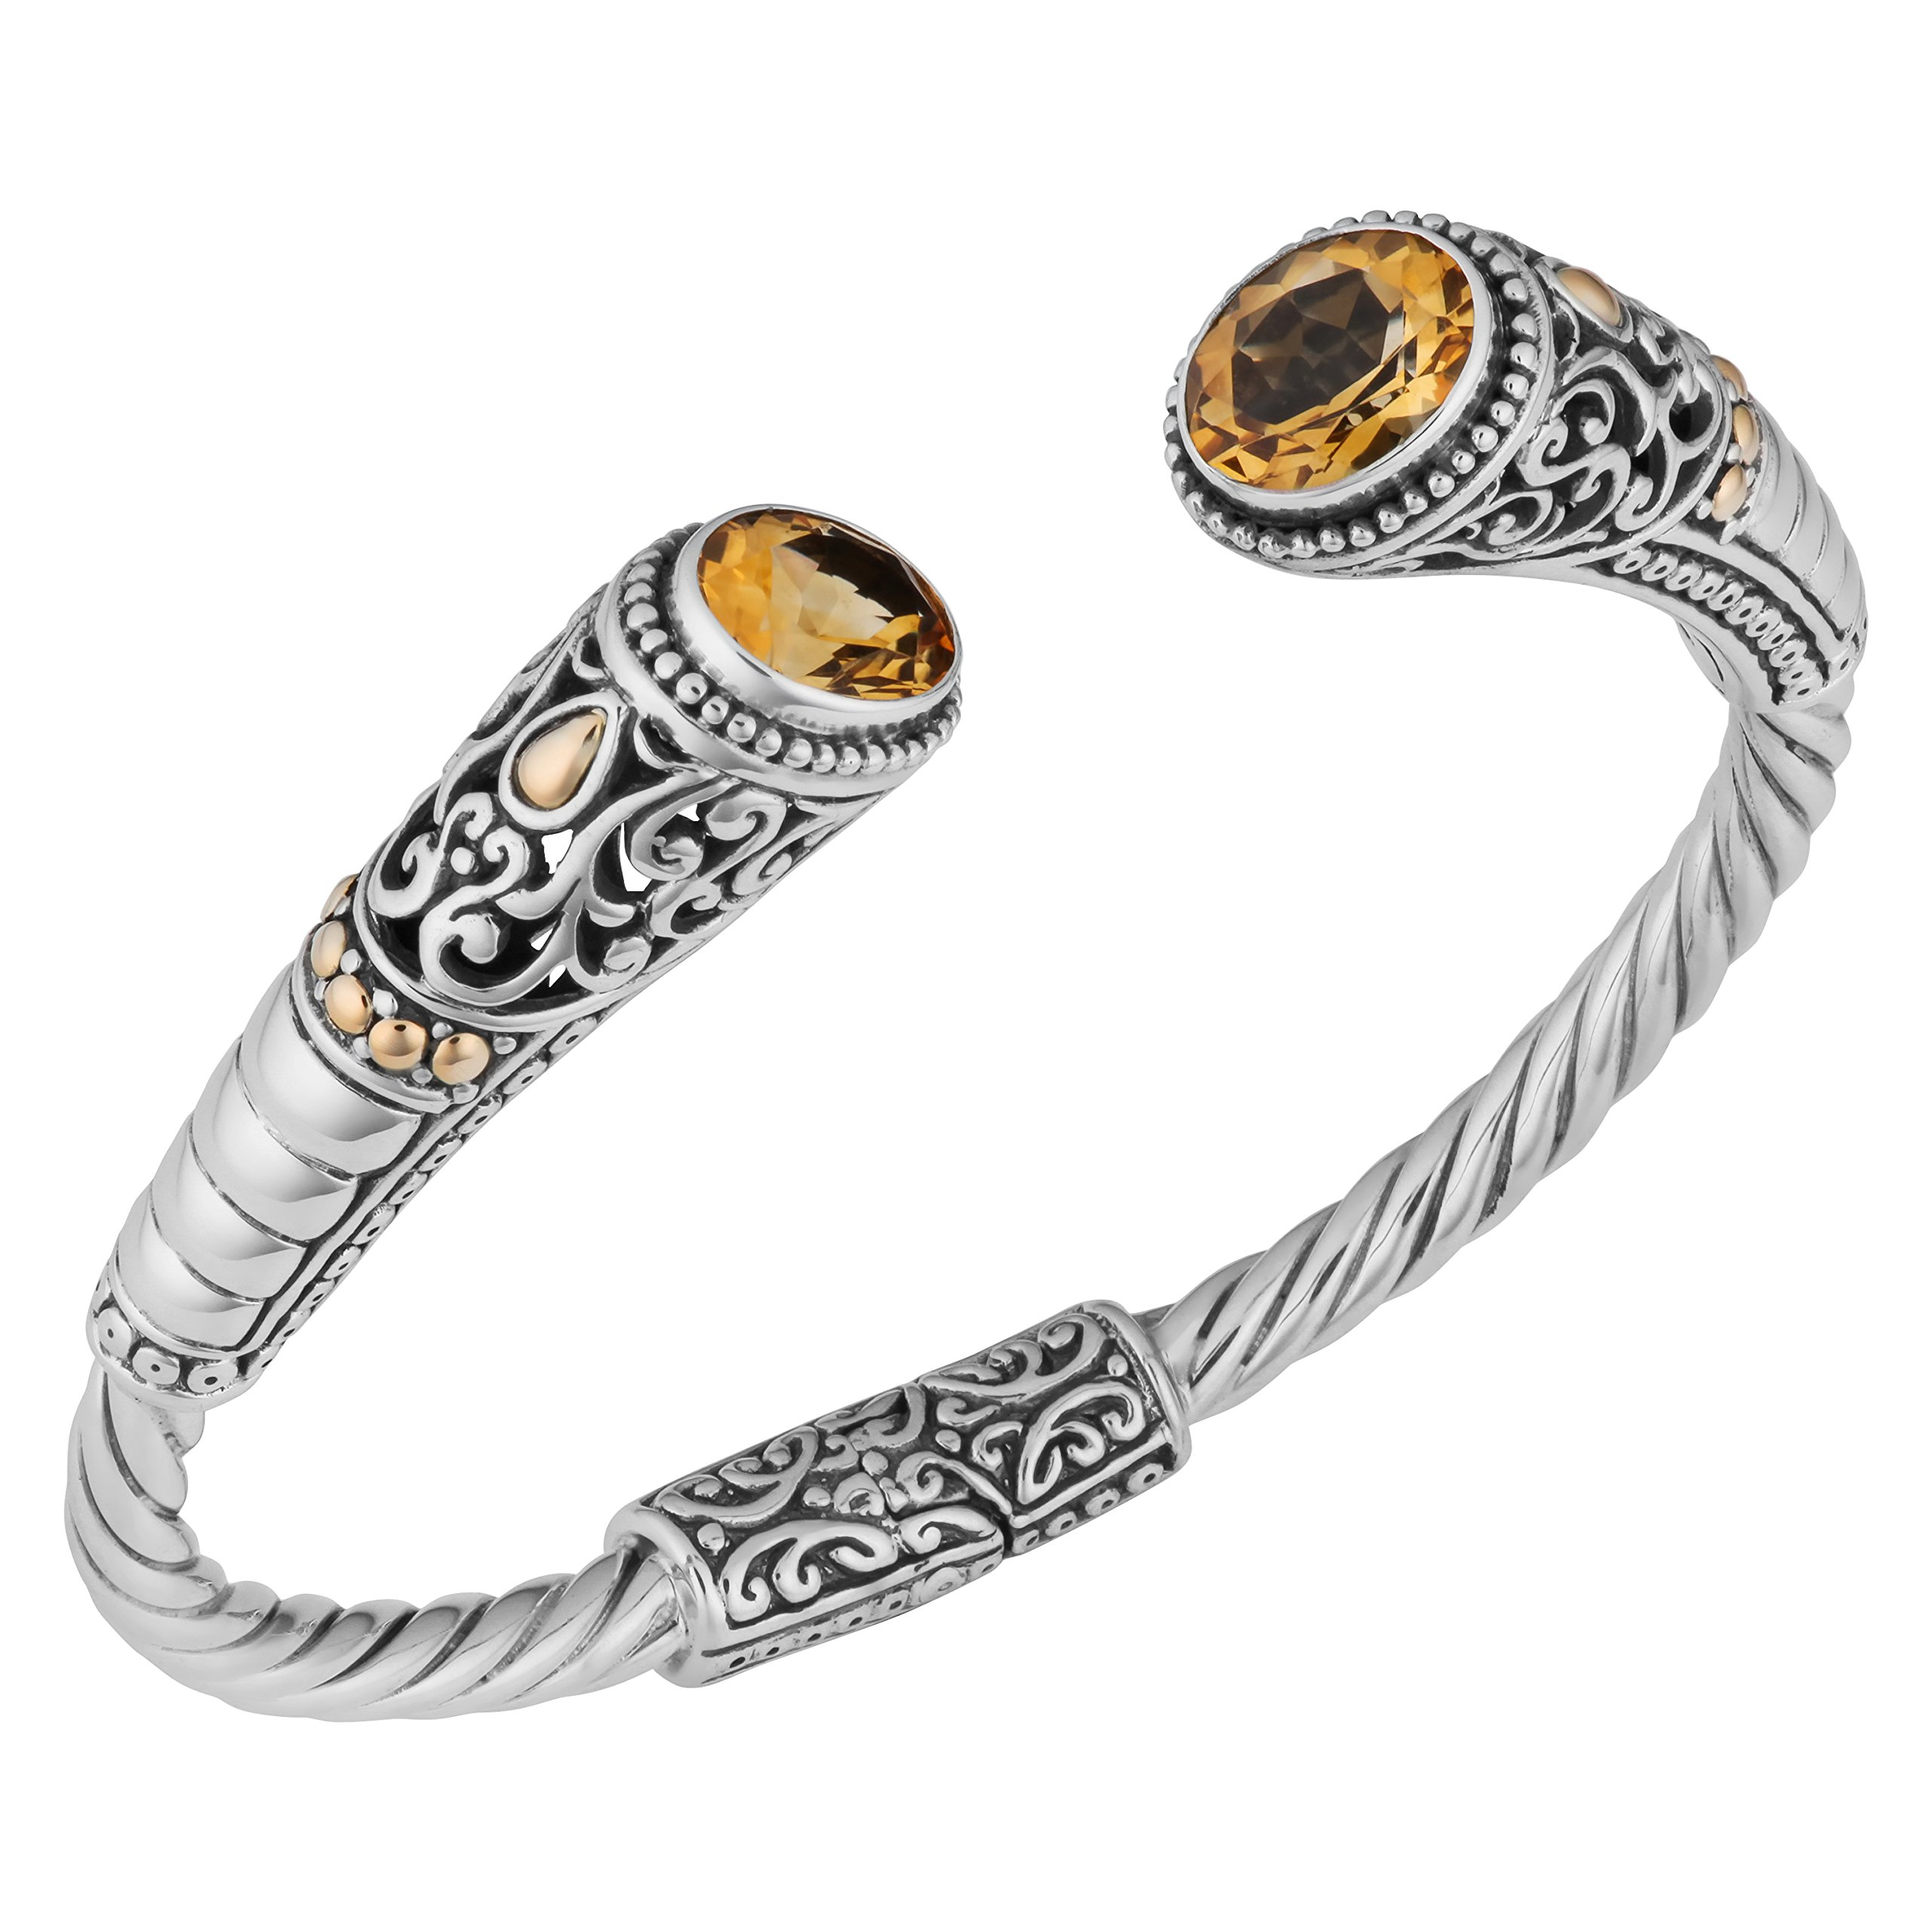 Artisanica 18 Karat Yellow Gold Sterling Silver Citrine Bali Cuff Bracelet